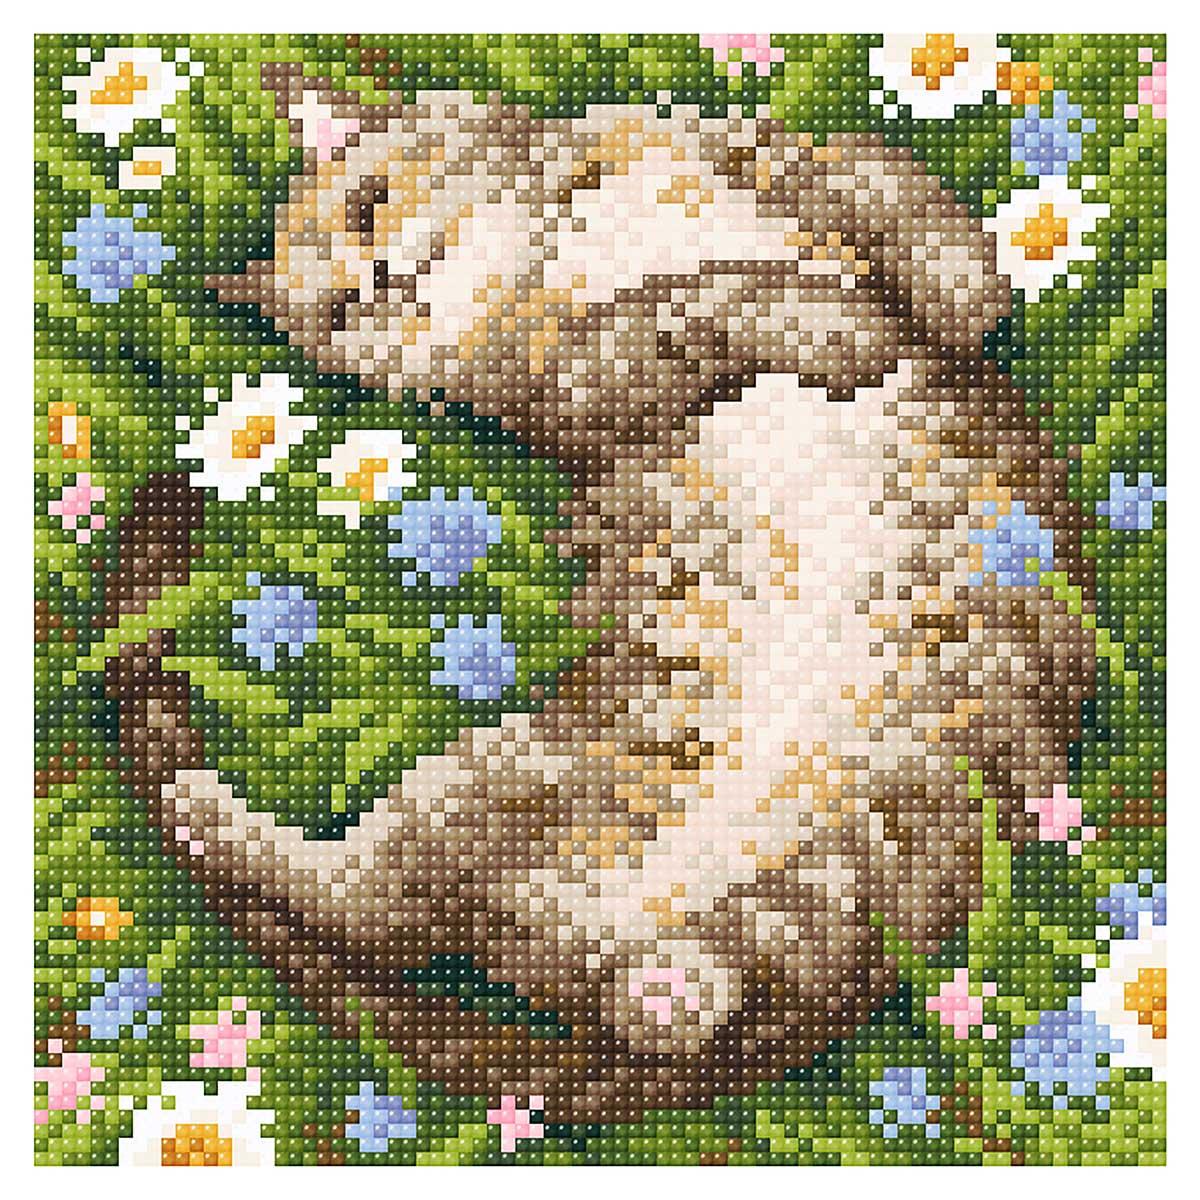 МС 044 Алмазная мозаика 'Ромашковое лето'20*20см Brilliart